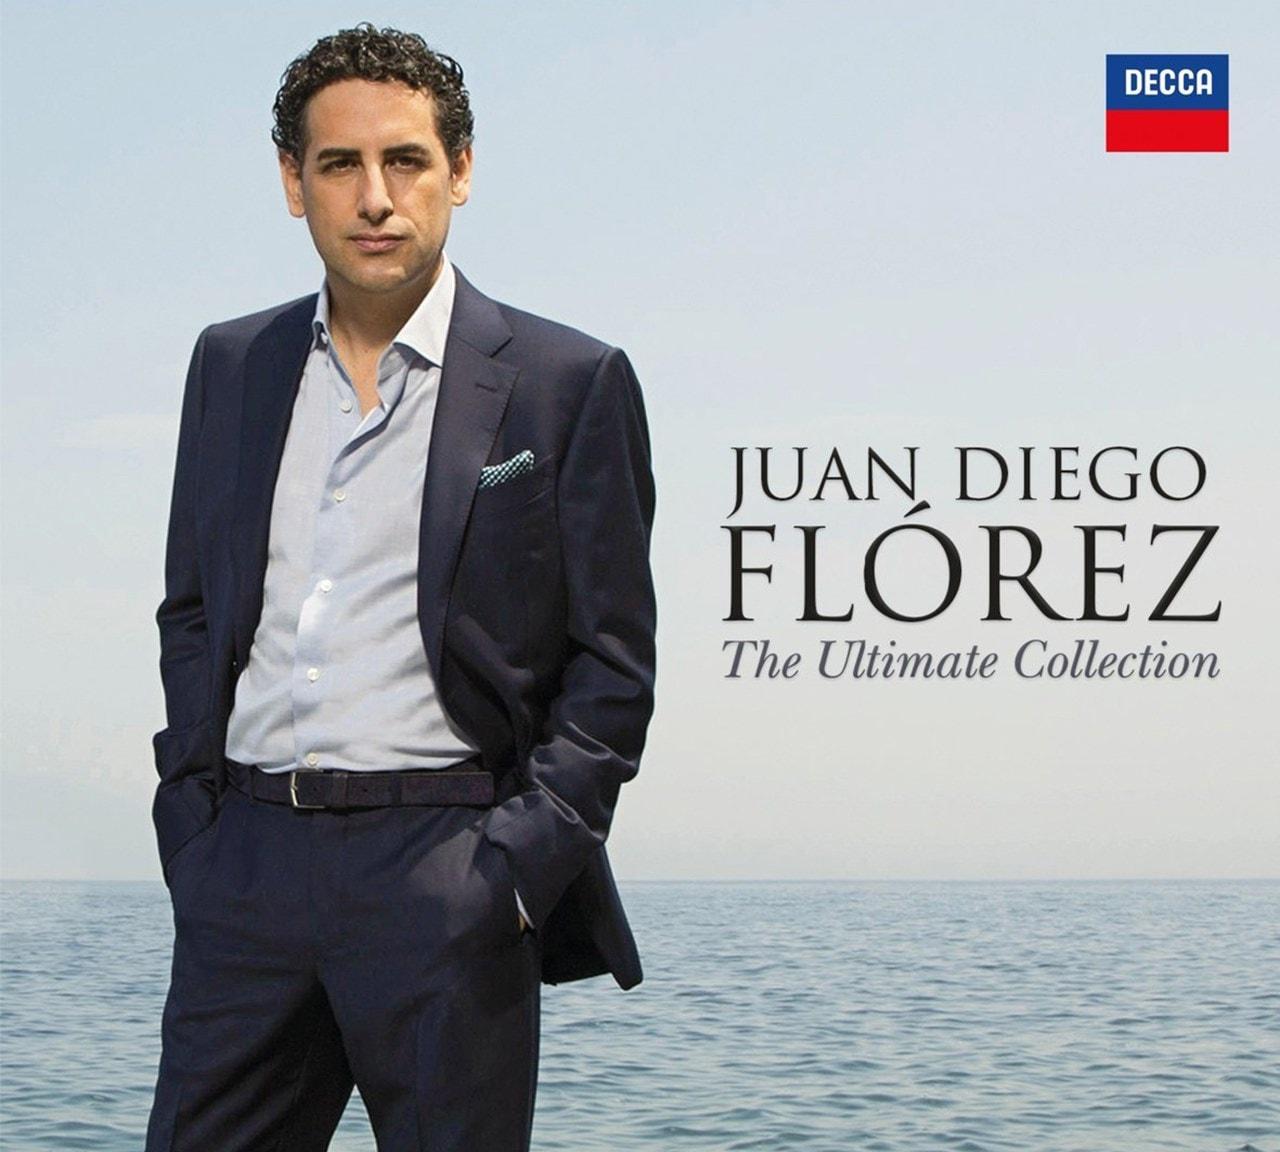 Juan Diego Florez: The Ultimate Collection - 1